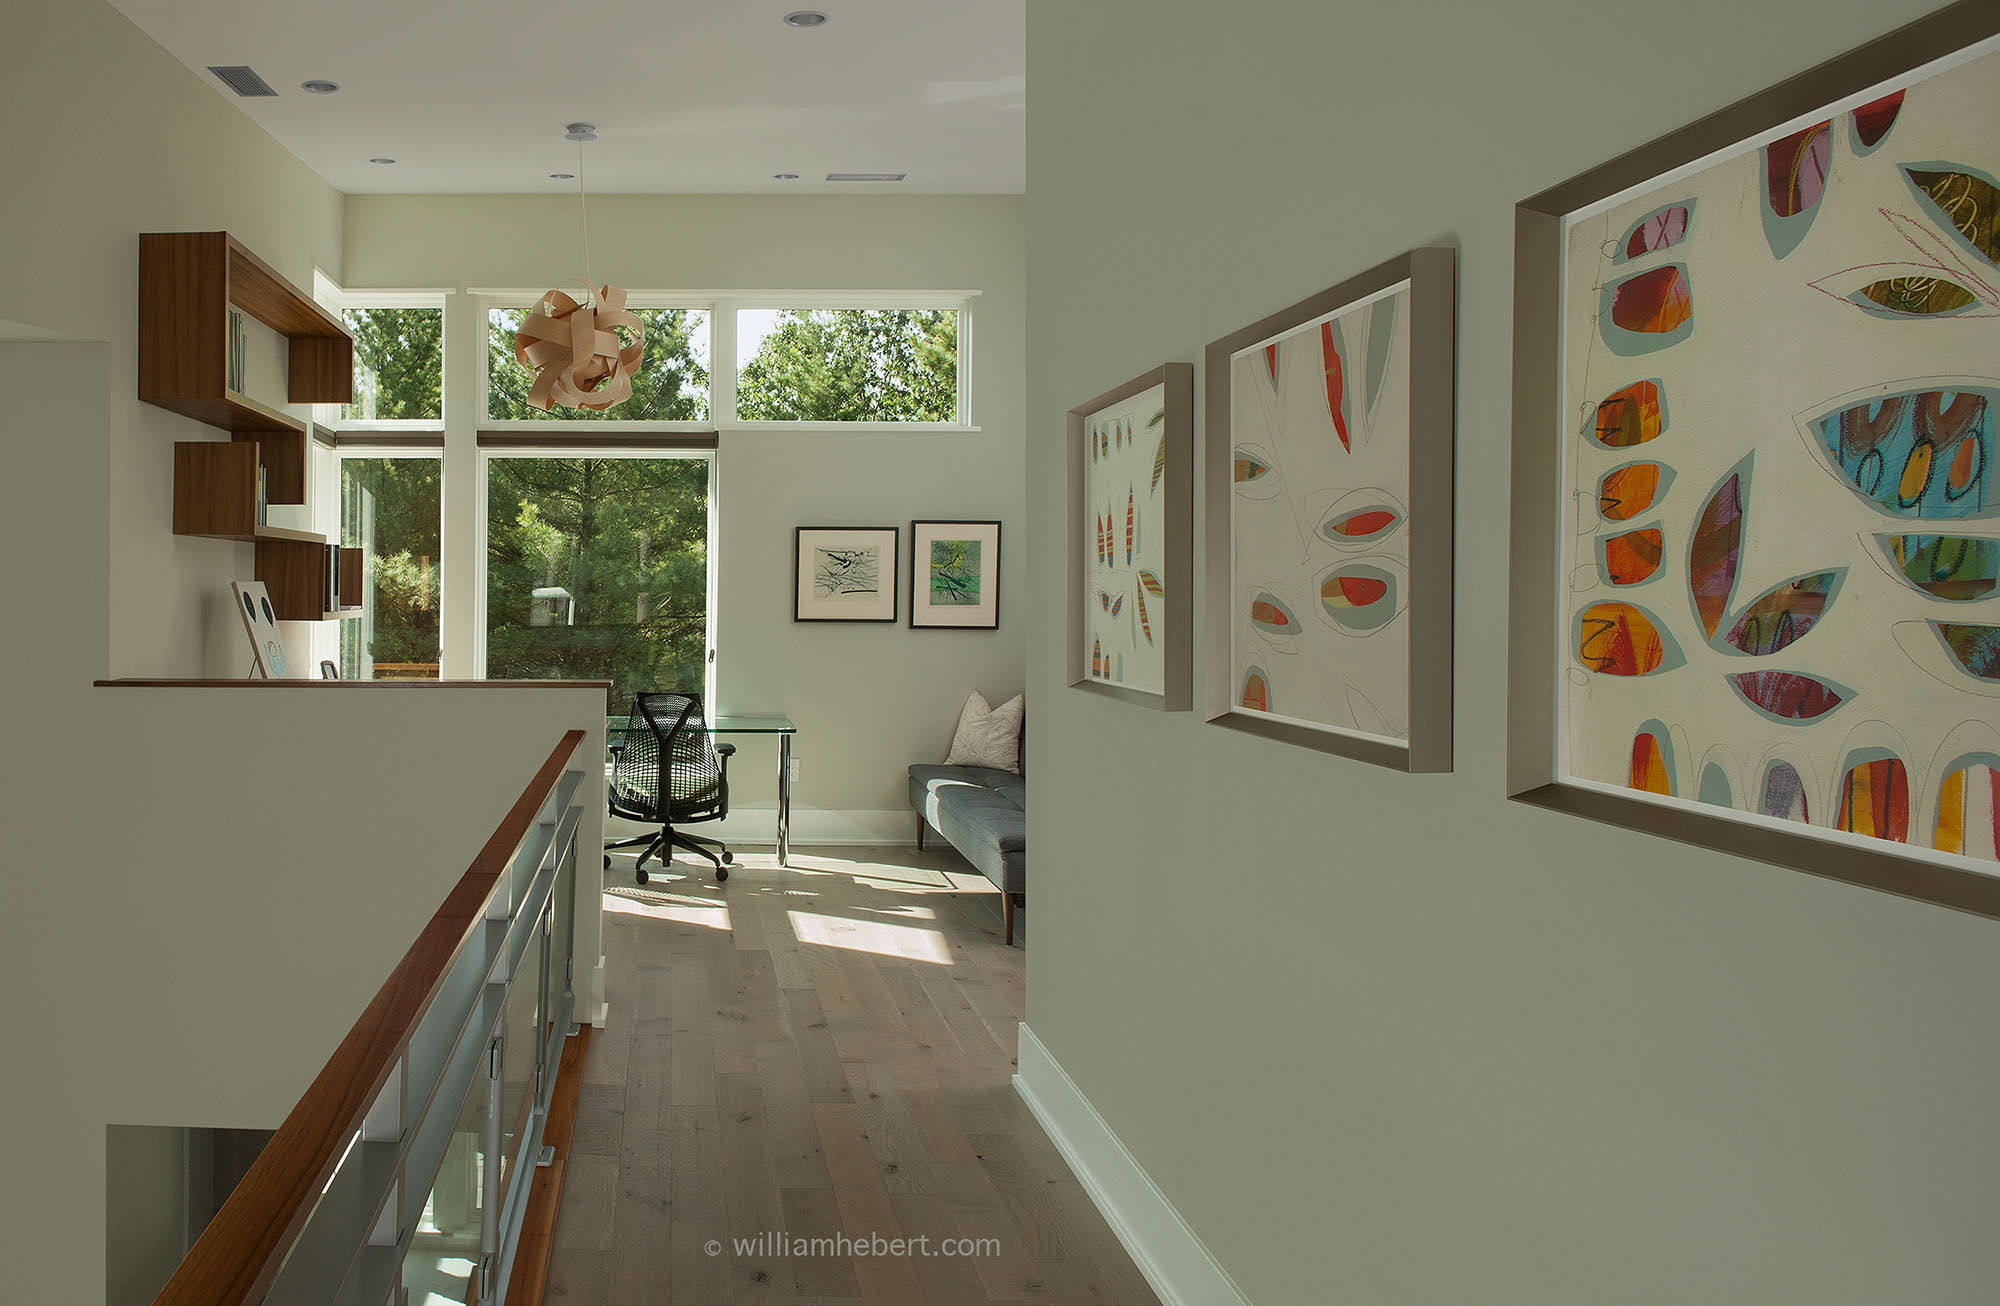 Architecture_Interior_7.jpg